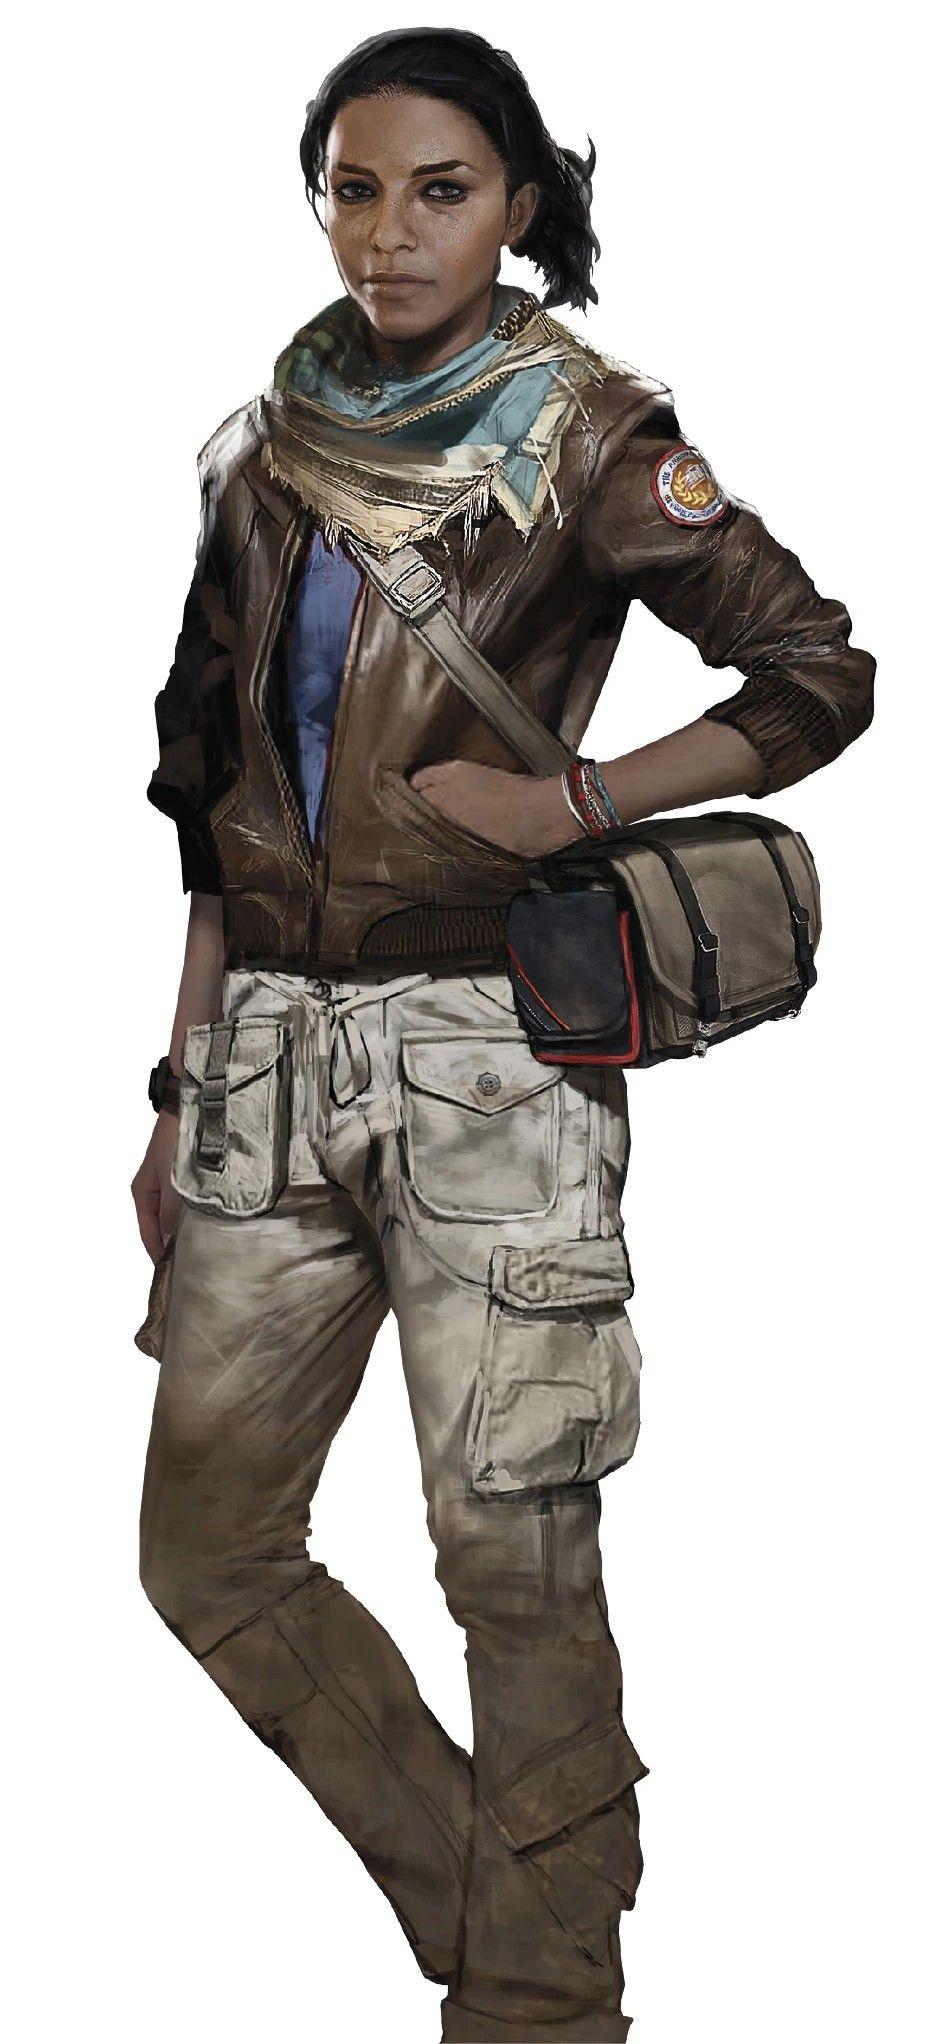 Assassin S Creed Origins Concept Art Of Layla Hassan